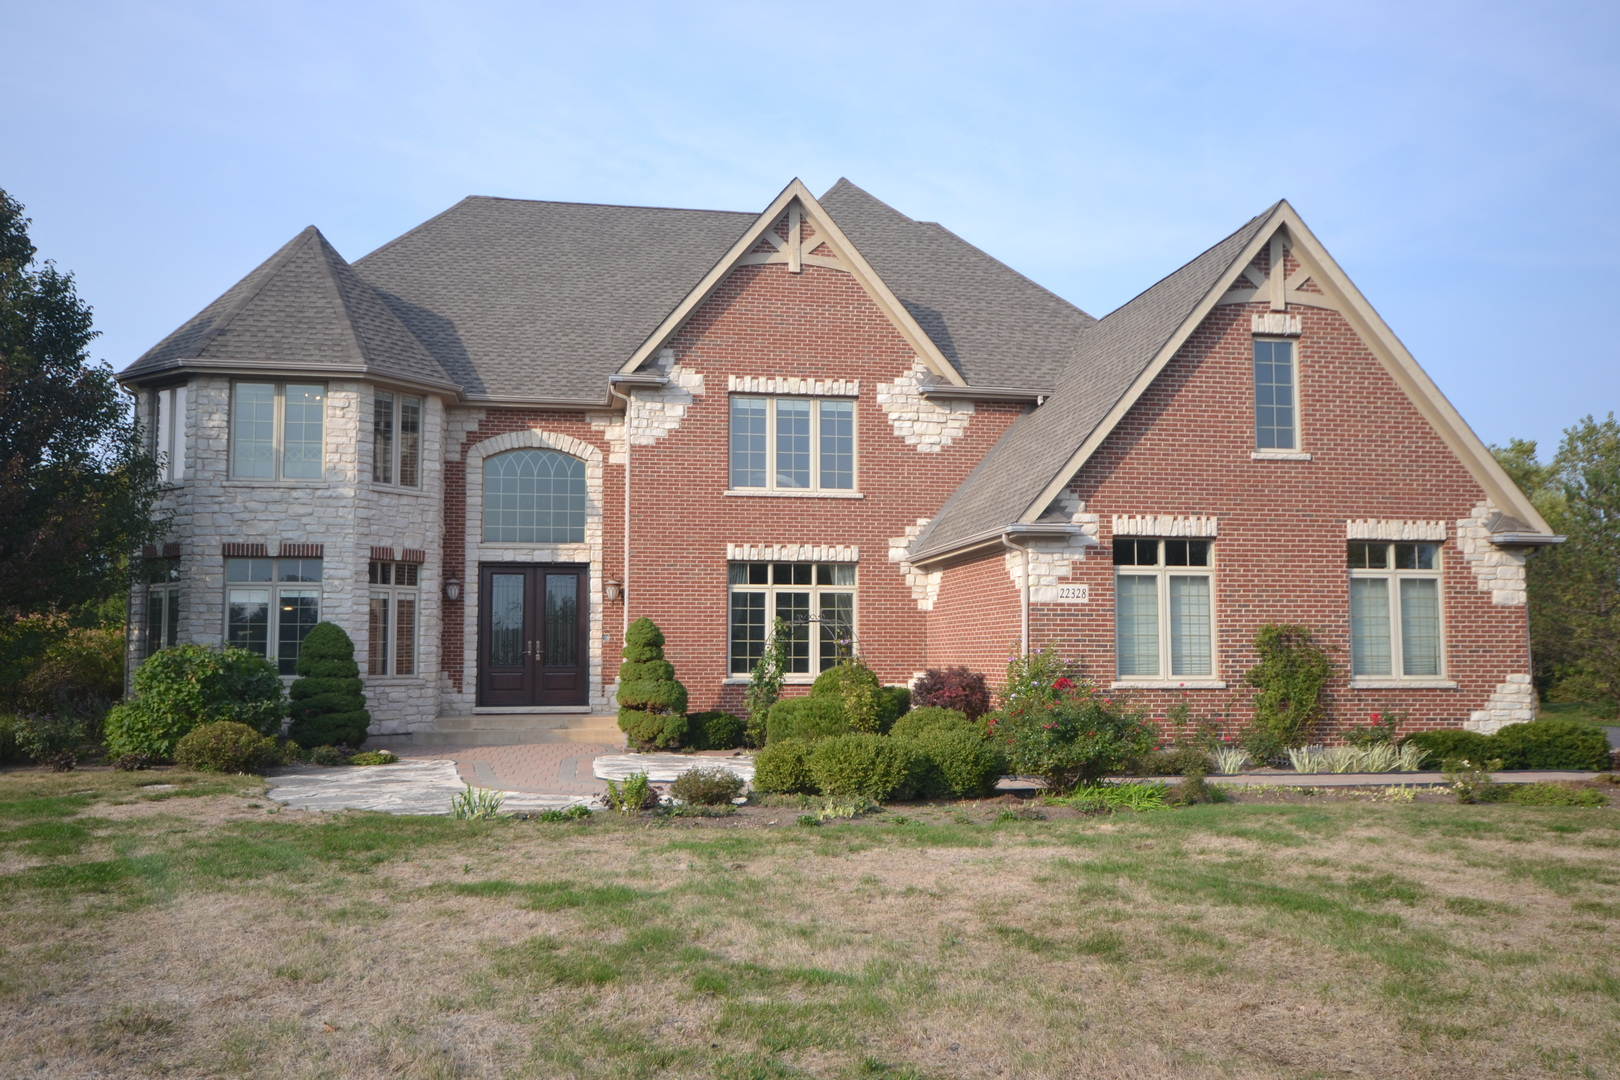 22328 N Prairie Court, Kildeer, Il 60047